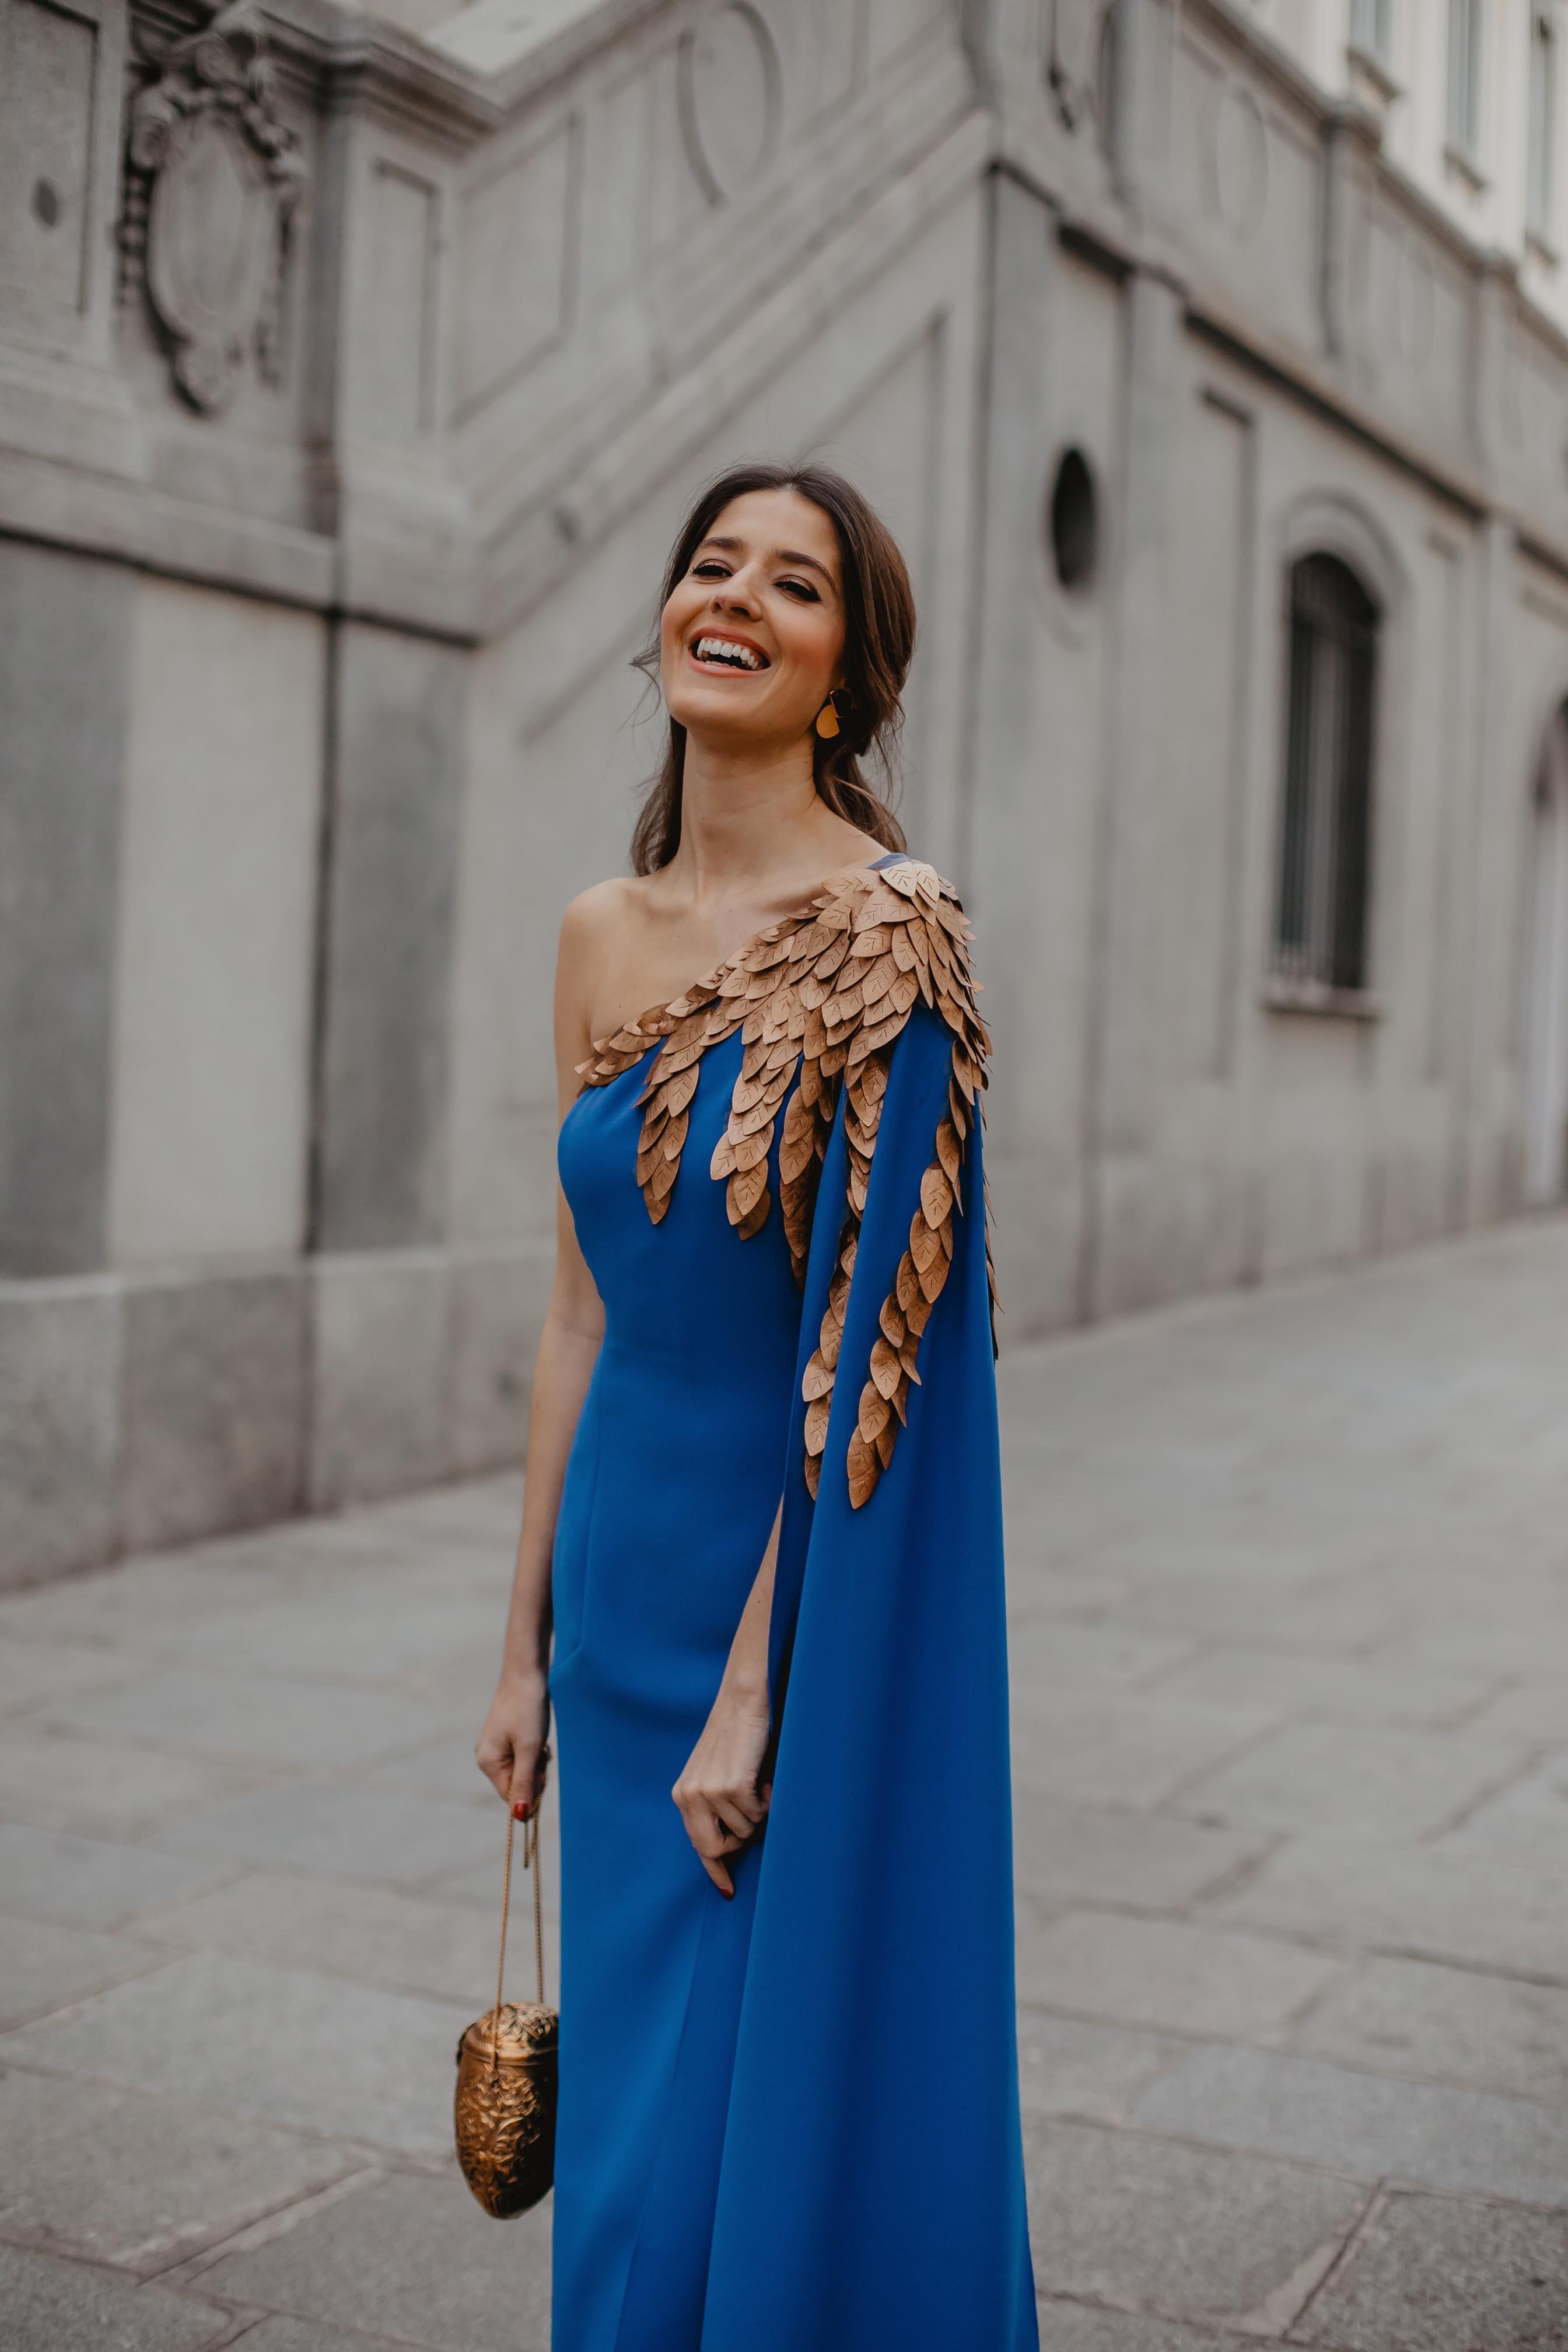 Look invitada 2019 boda noche vestido largo hermana novia